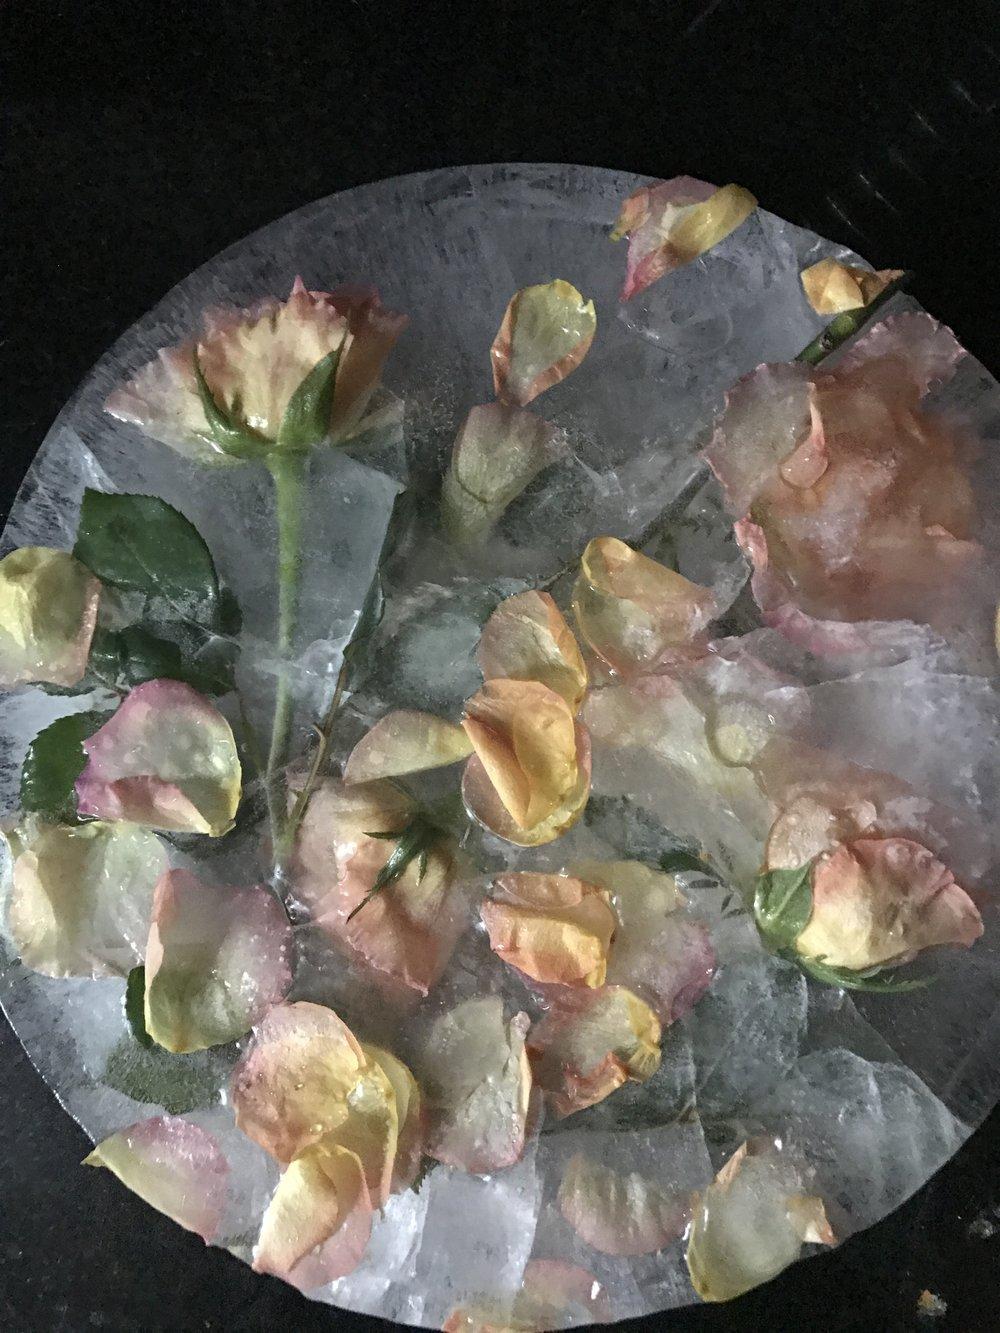 ROSE FLOWER ICE